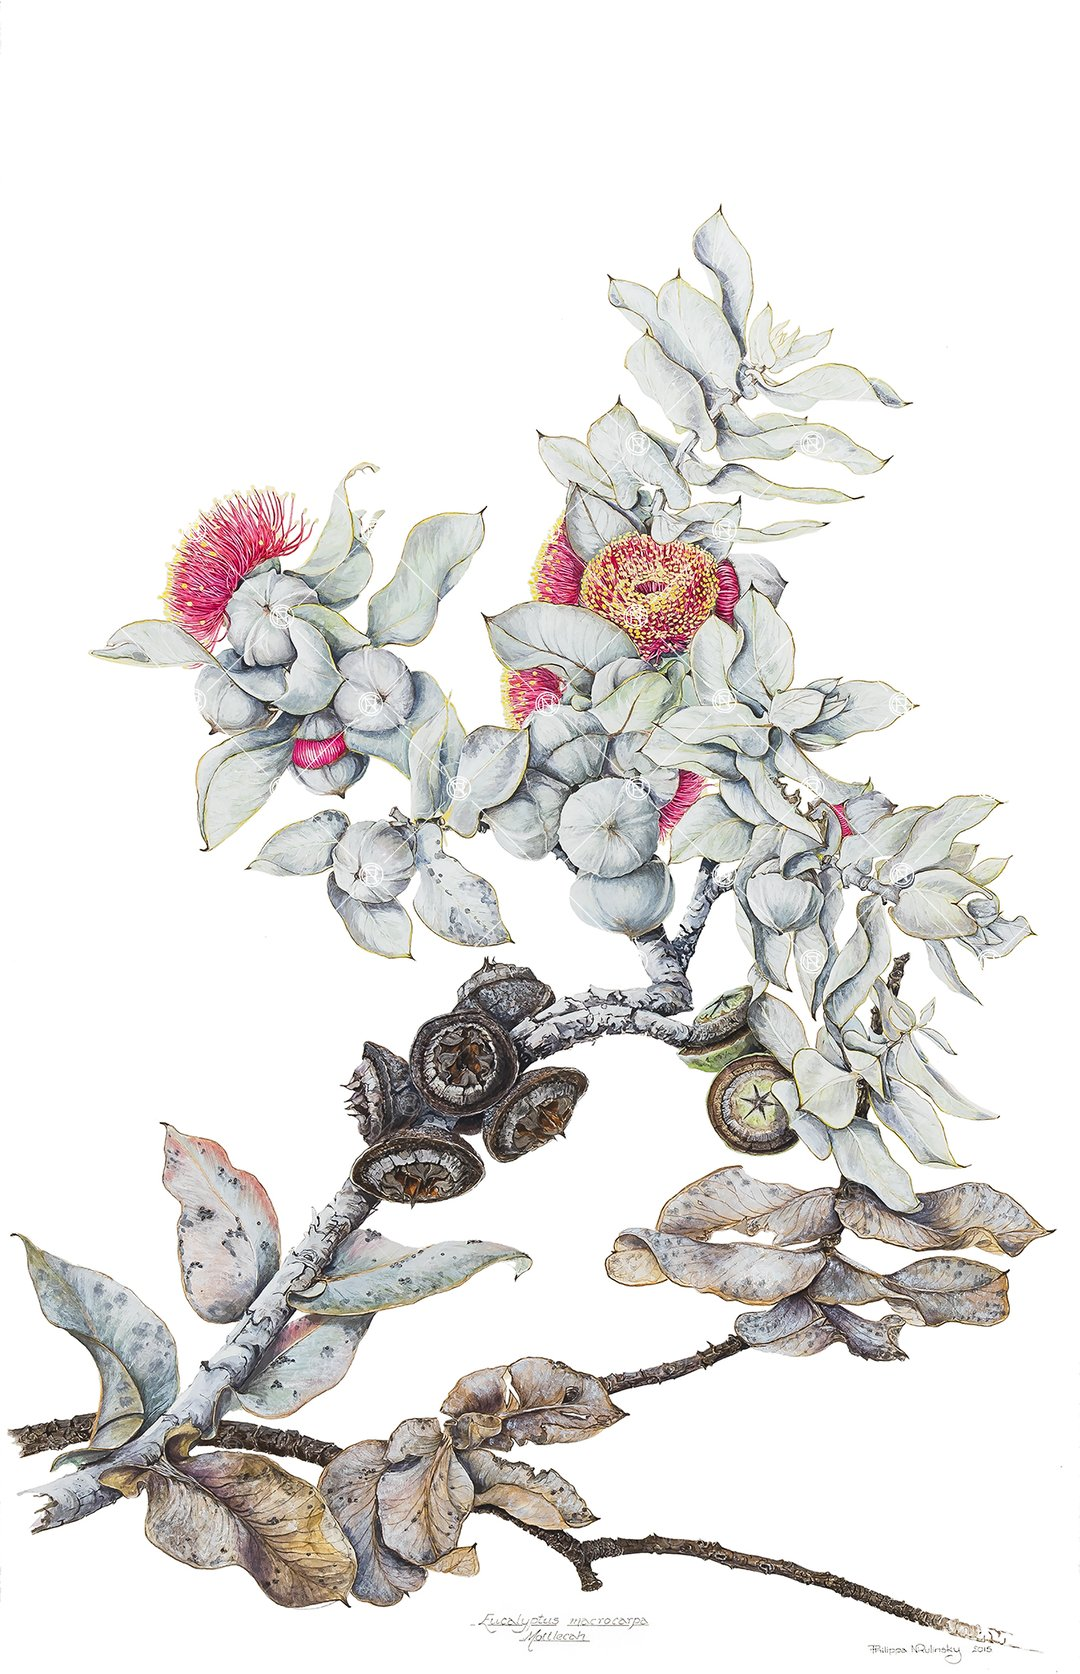 Eucalyptus macrocarpa,  watercolour, pencil, gouache on hot-pressed Arches paper, 2015, Philippa Nikulinsky artist